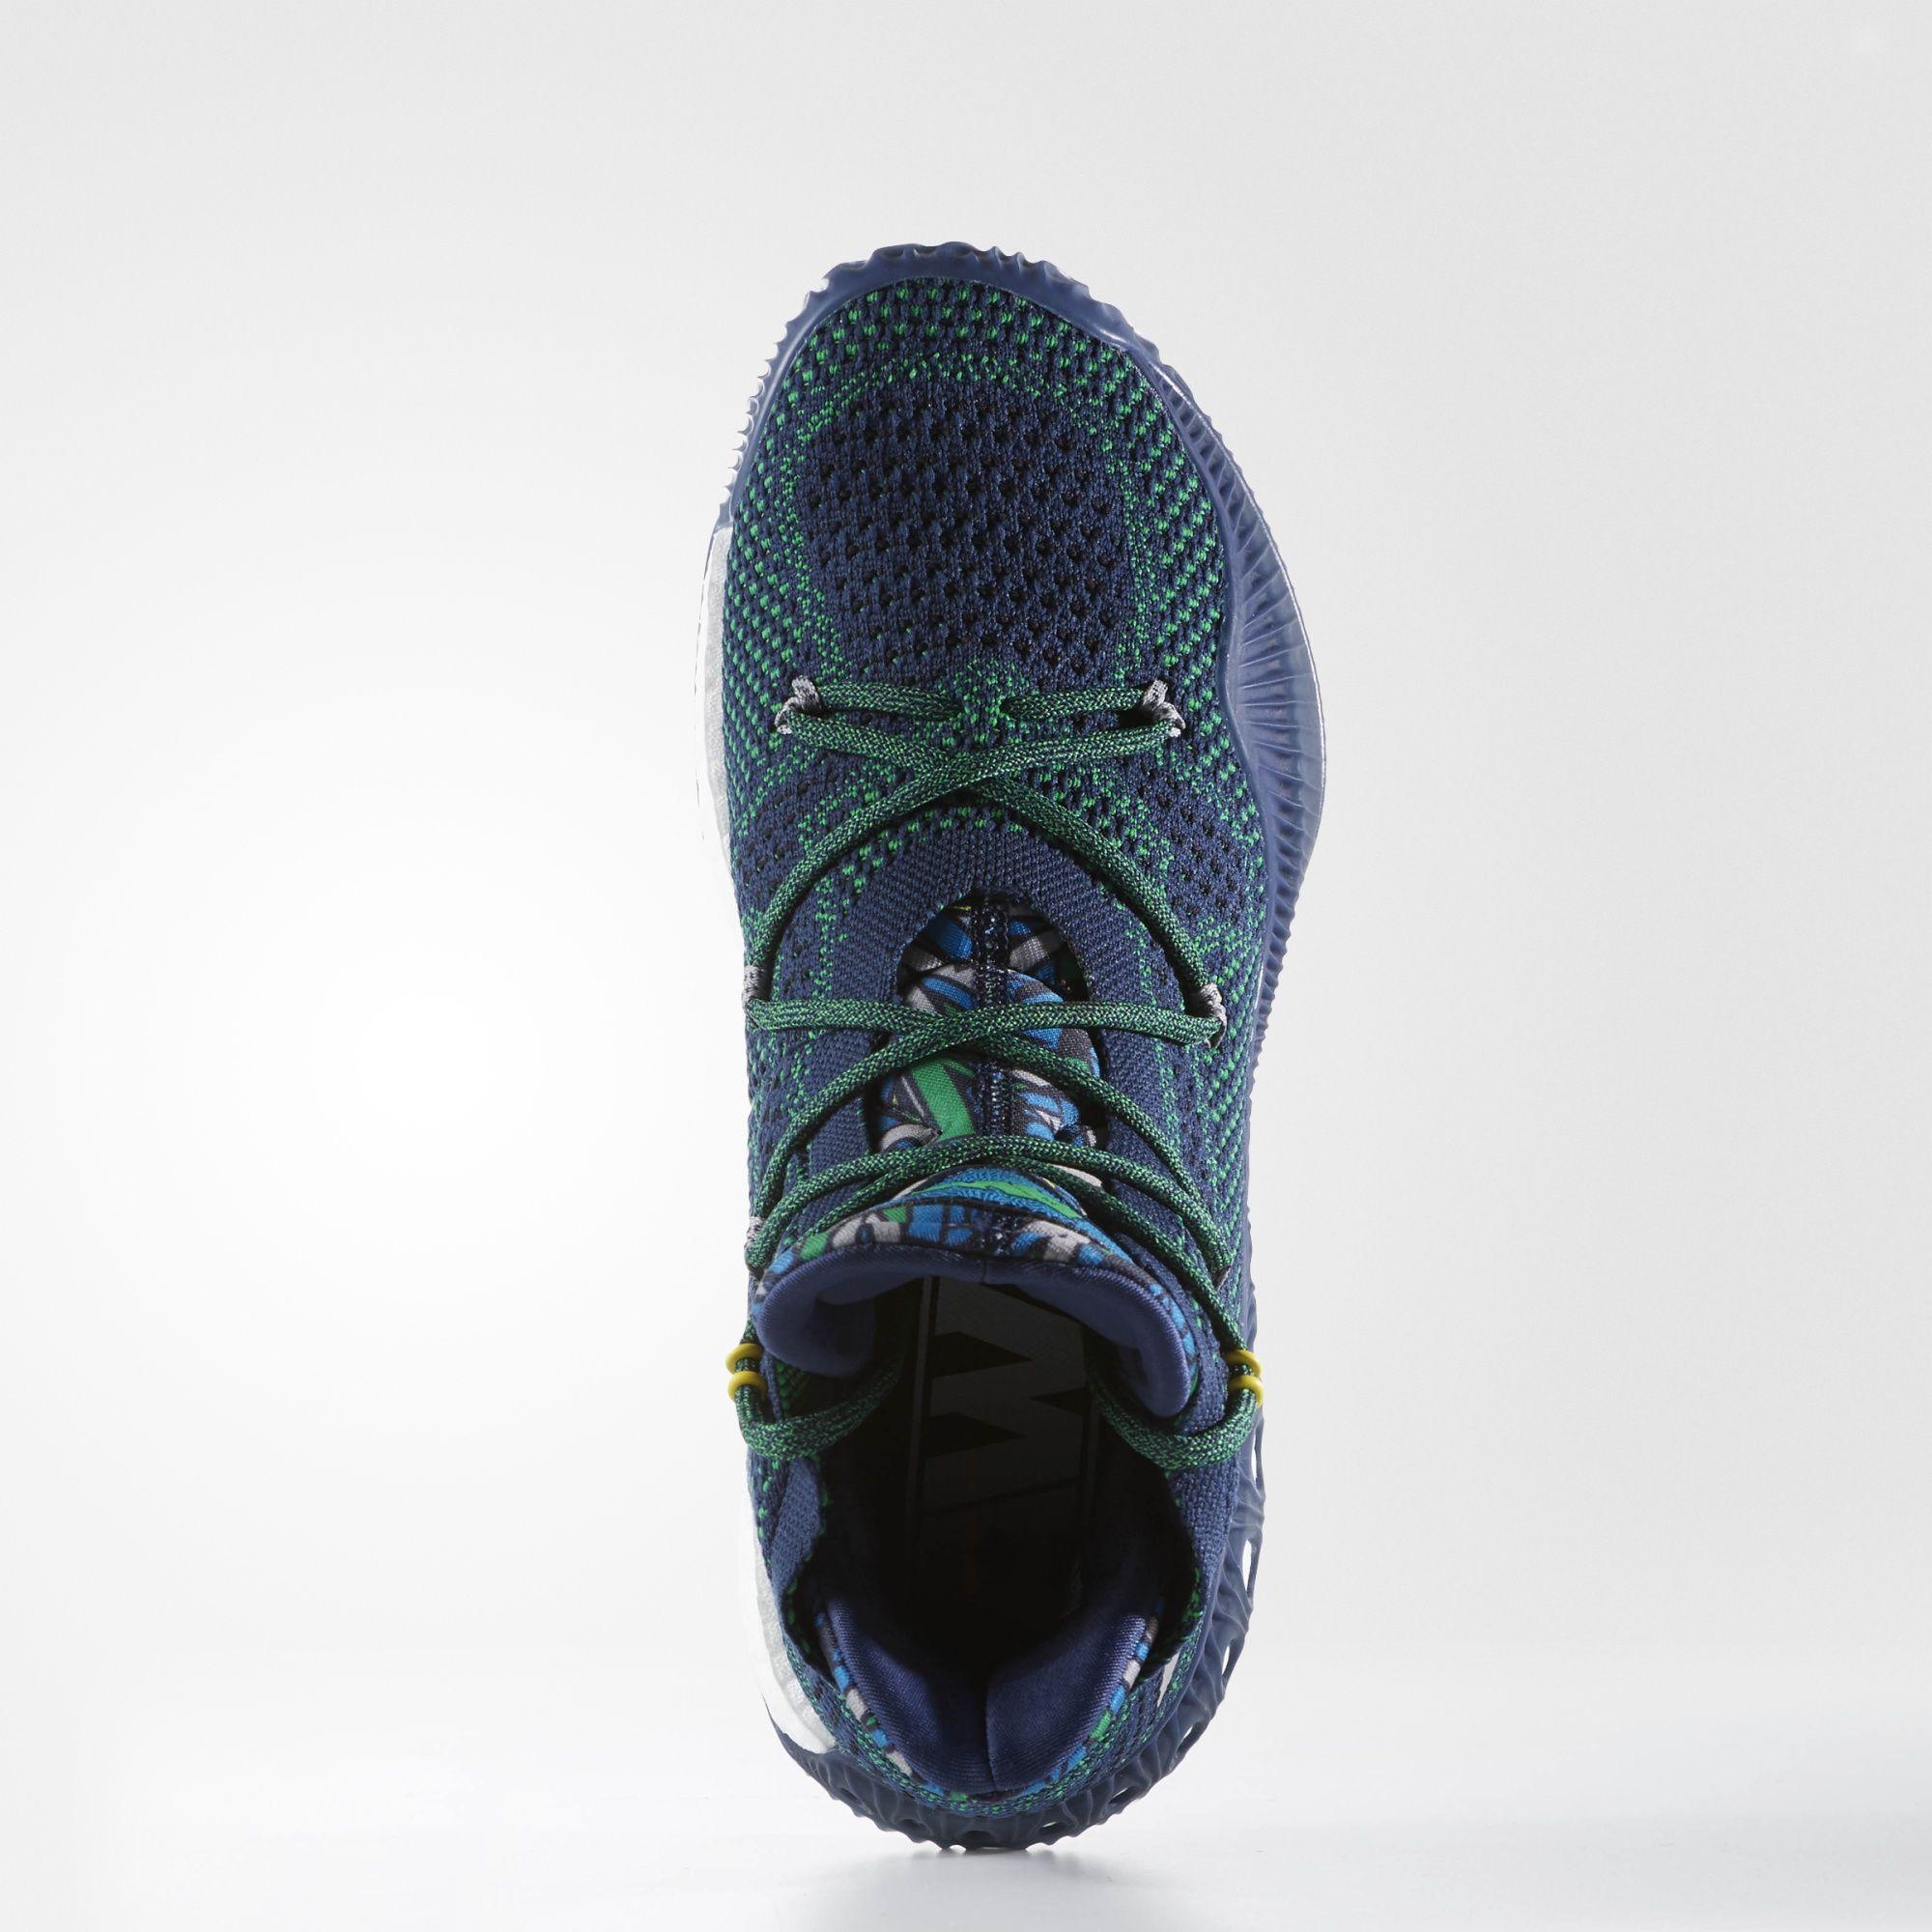 timeless design 2ed86 59000 adidas Crazy Explosive Andrew Wiggins Away Toe · adidas Crazy Explosive  Andrew Wiggins Away PE Medial Angle